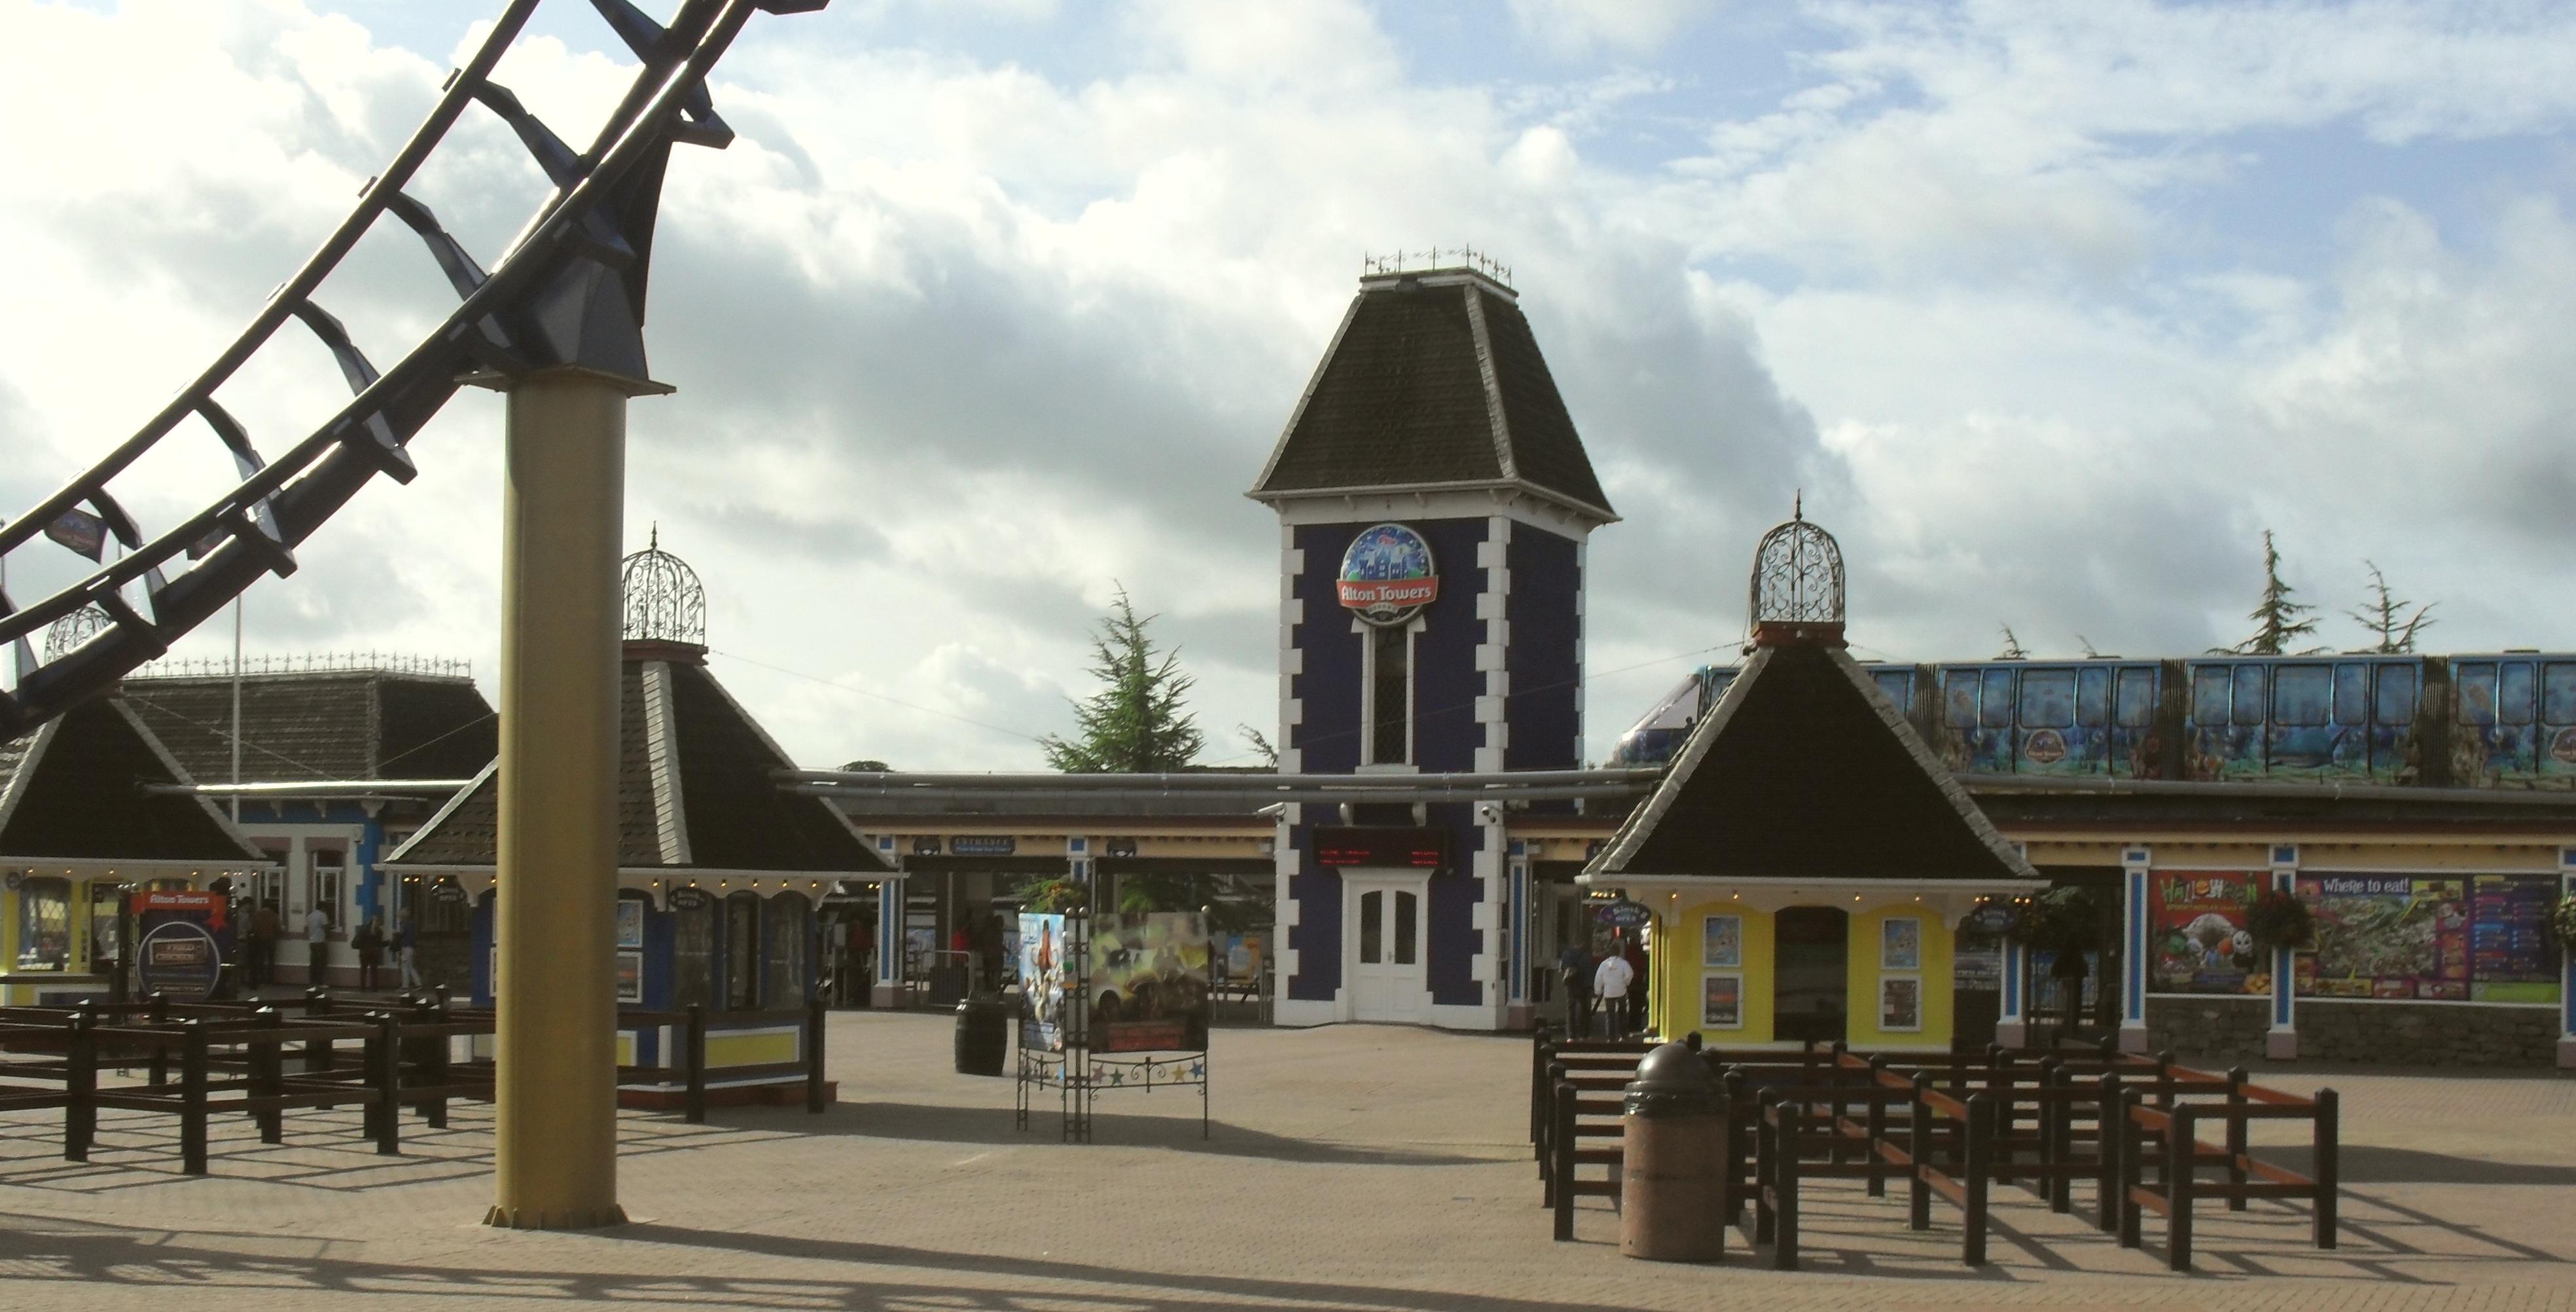 Http www alton towers co uk pages theme park - Http Www Alton Towers Co Uk Pages Theme Park 9